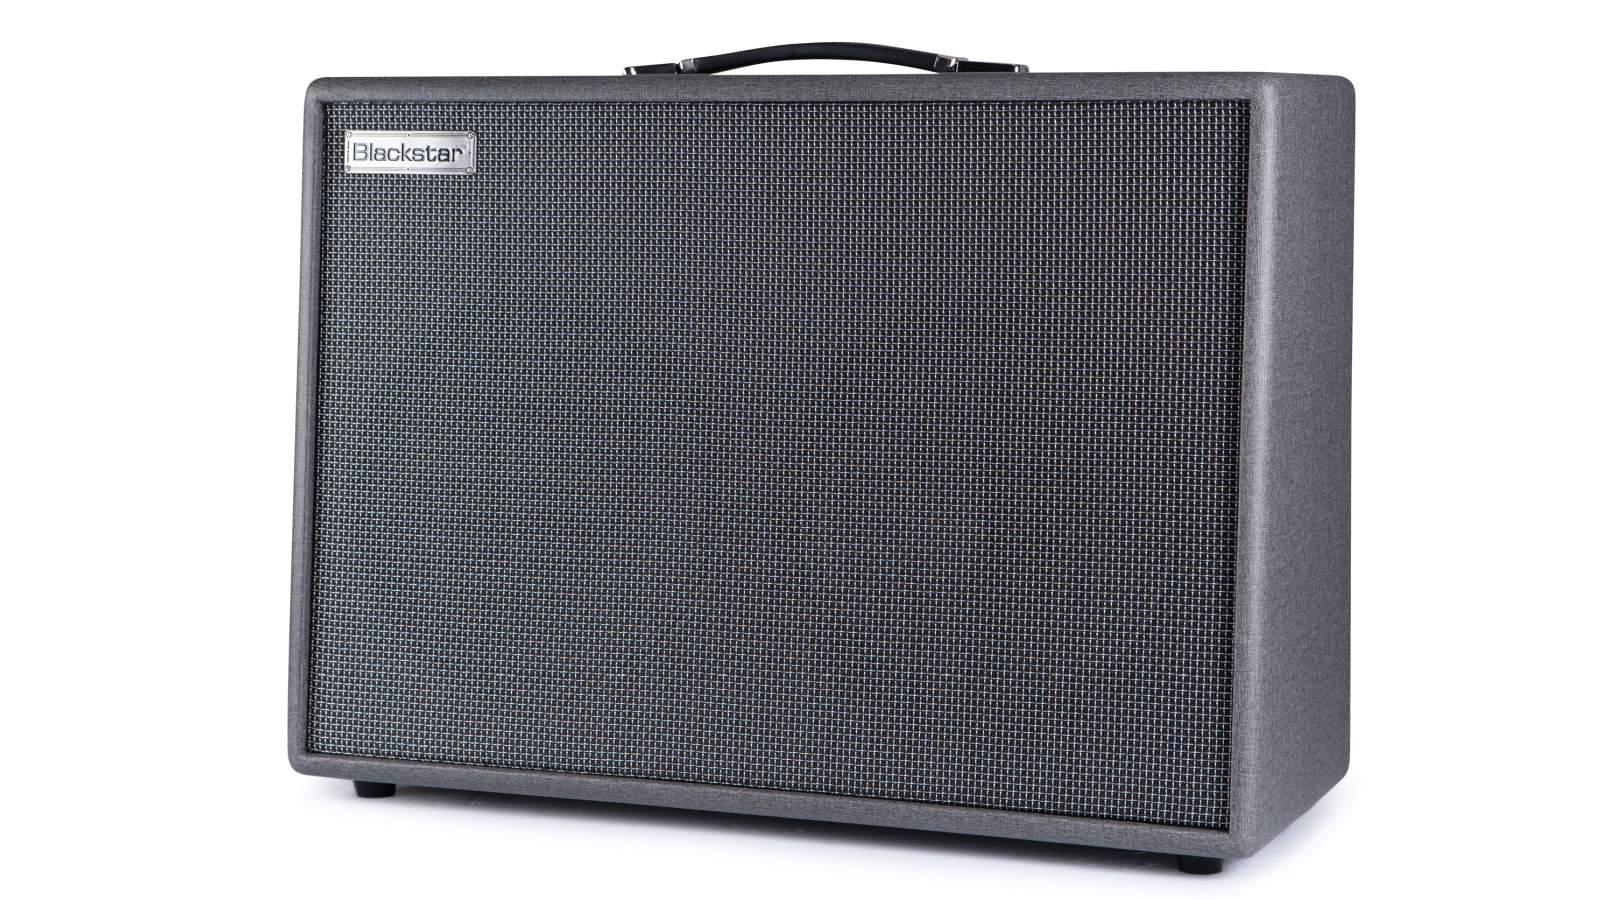 Blackstar Silverline Deluxe Combo 100